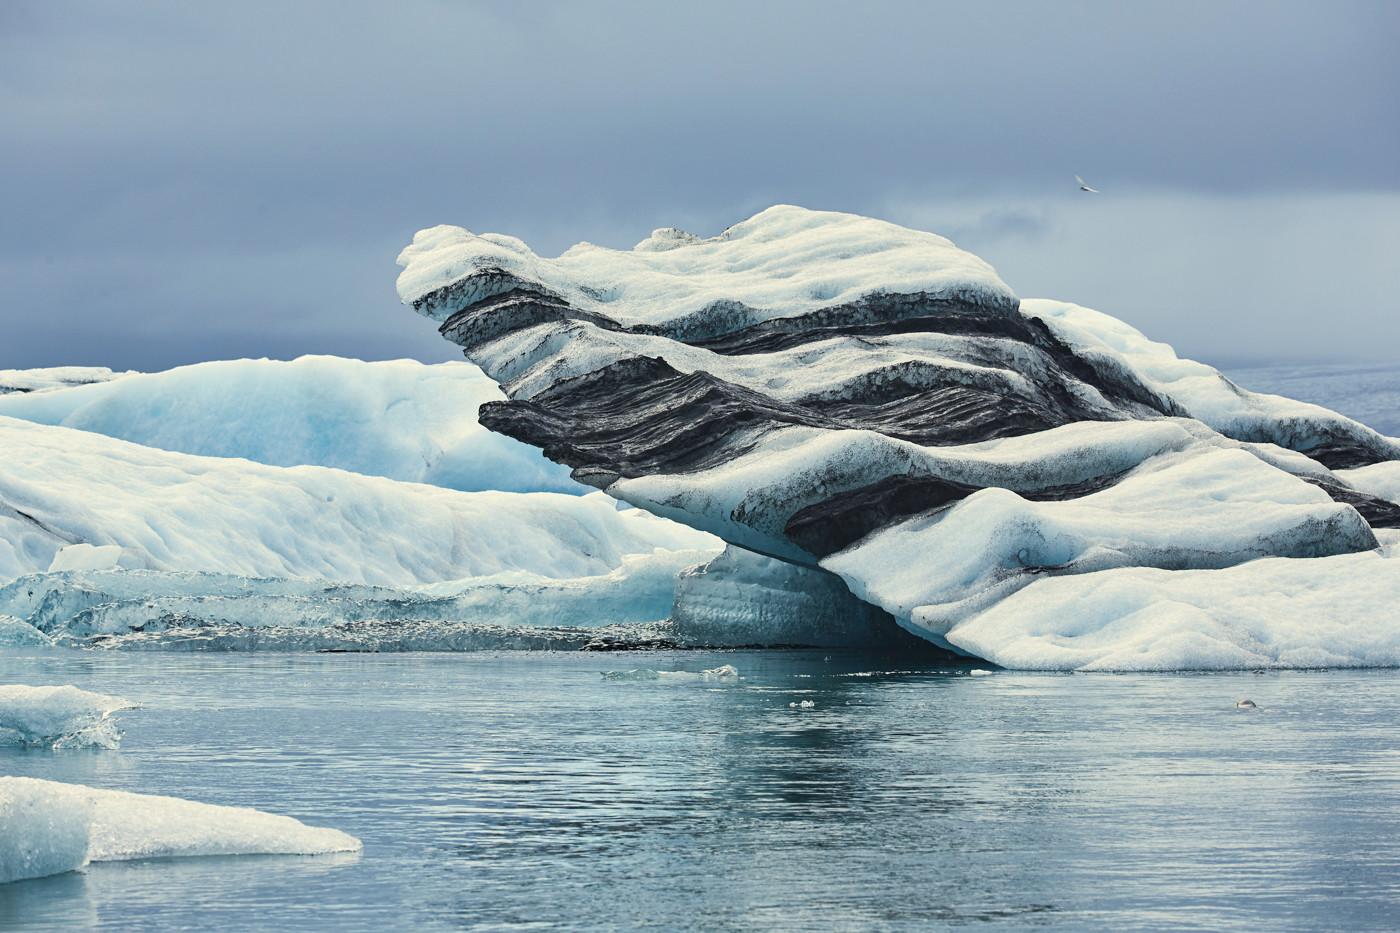 Jökulsárlón, eissee, ice lagoon, ice lake, lagoon, eis, eisschollen, gletschereis, bootstouren, reiseblog, reiseblogger, miles and shores, eisscholle, eisberg, vulkanasche